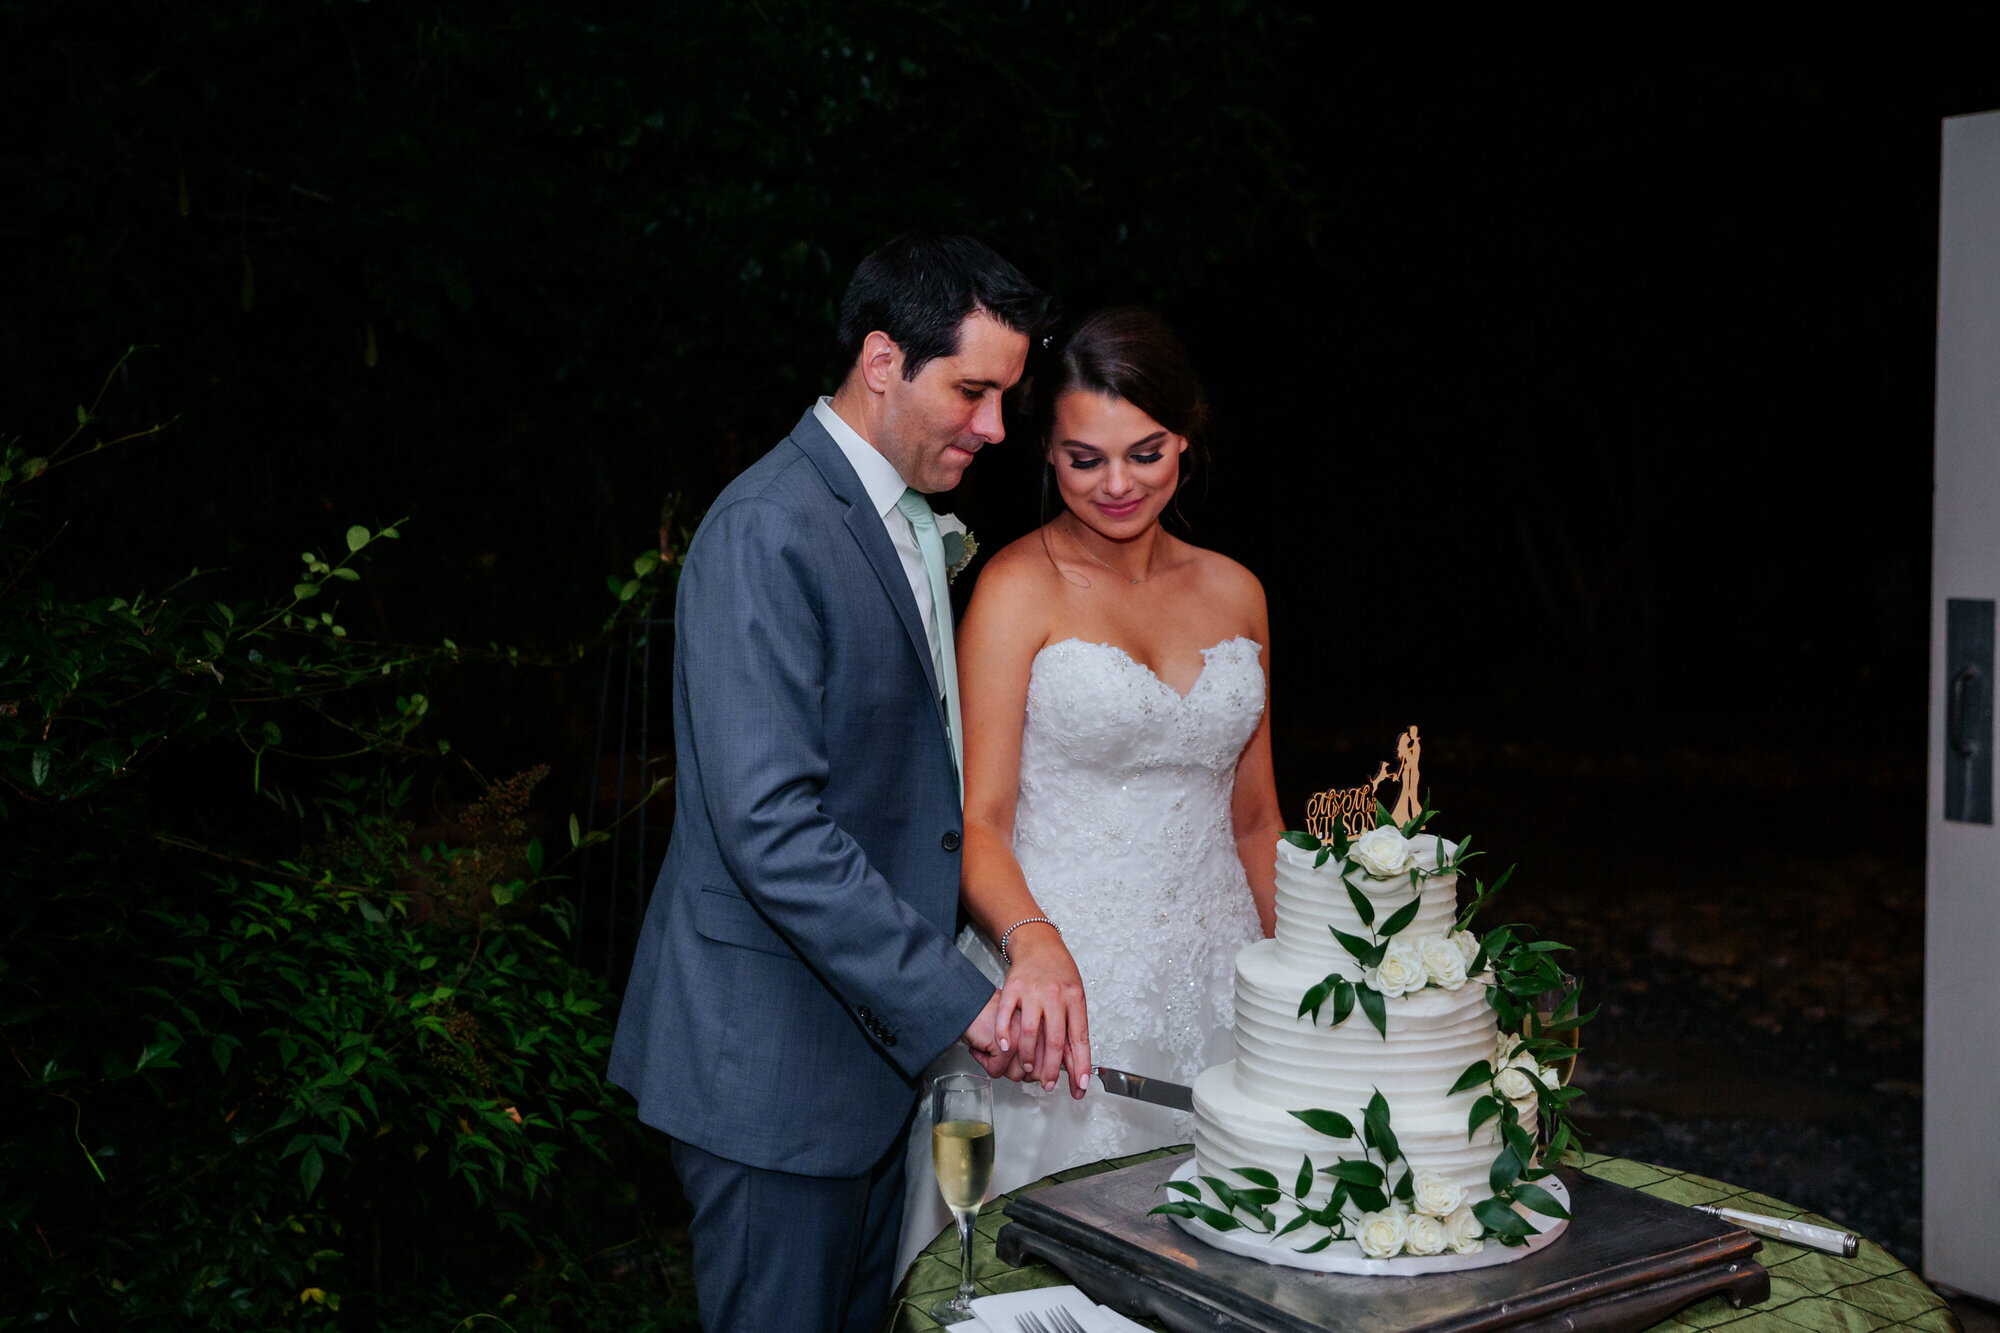 twigs-tempietto-wedding-greenville-downtown-388.JPG